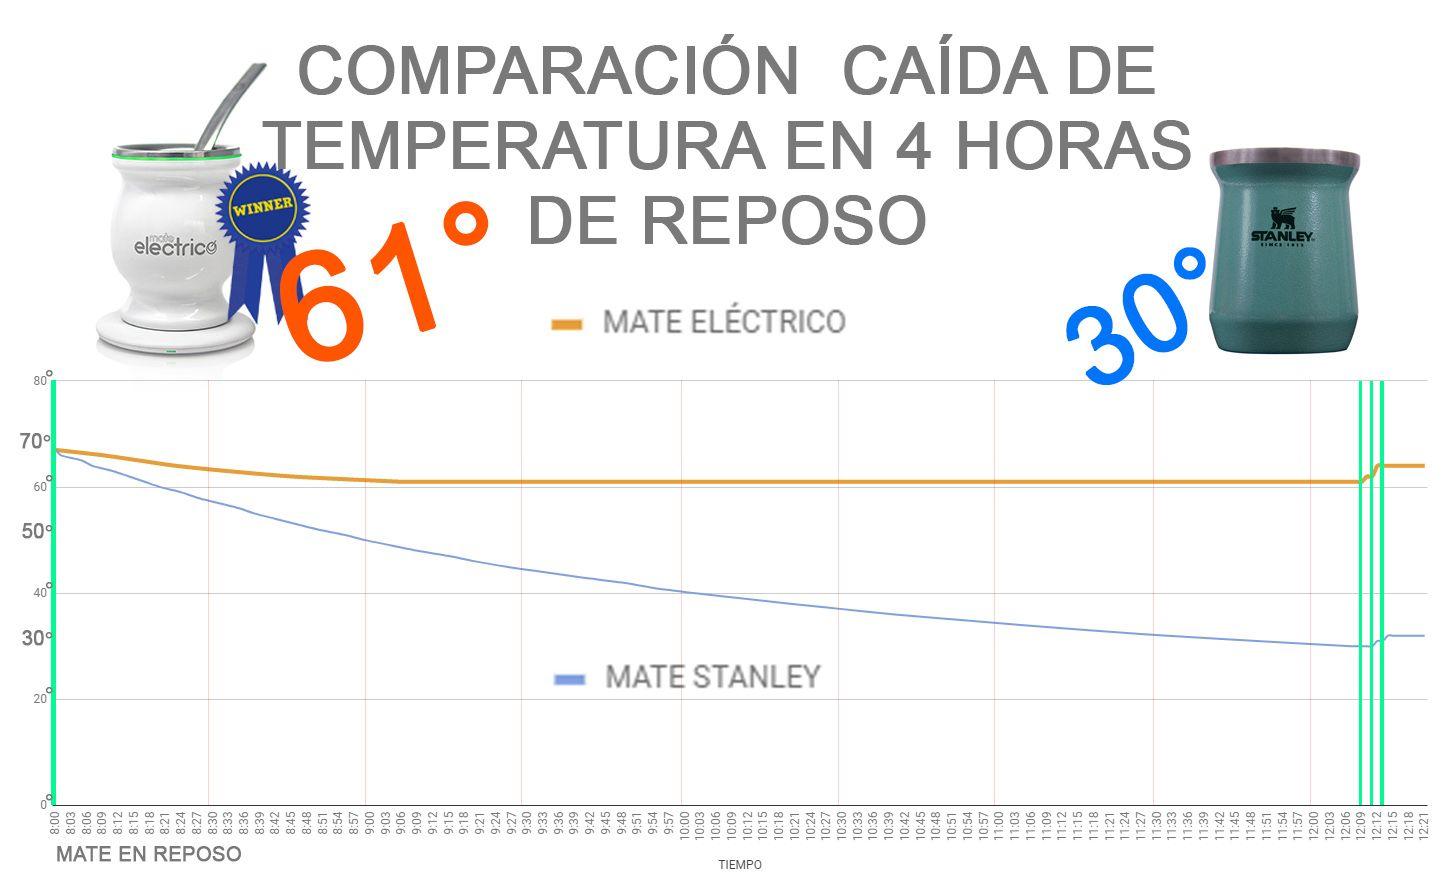 comparacion_mate_stanley_vs_mate_electrico_argentina_uruguay_grafico_chart_lineal